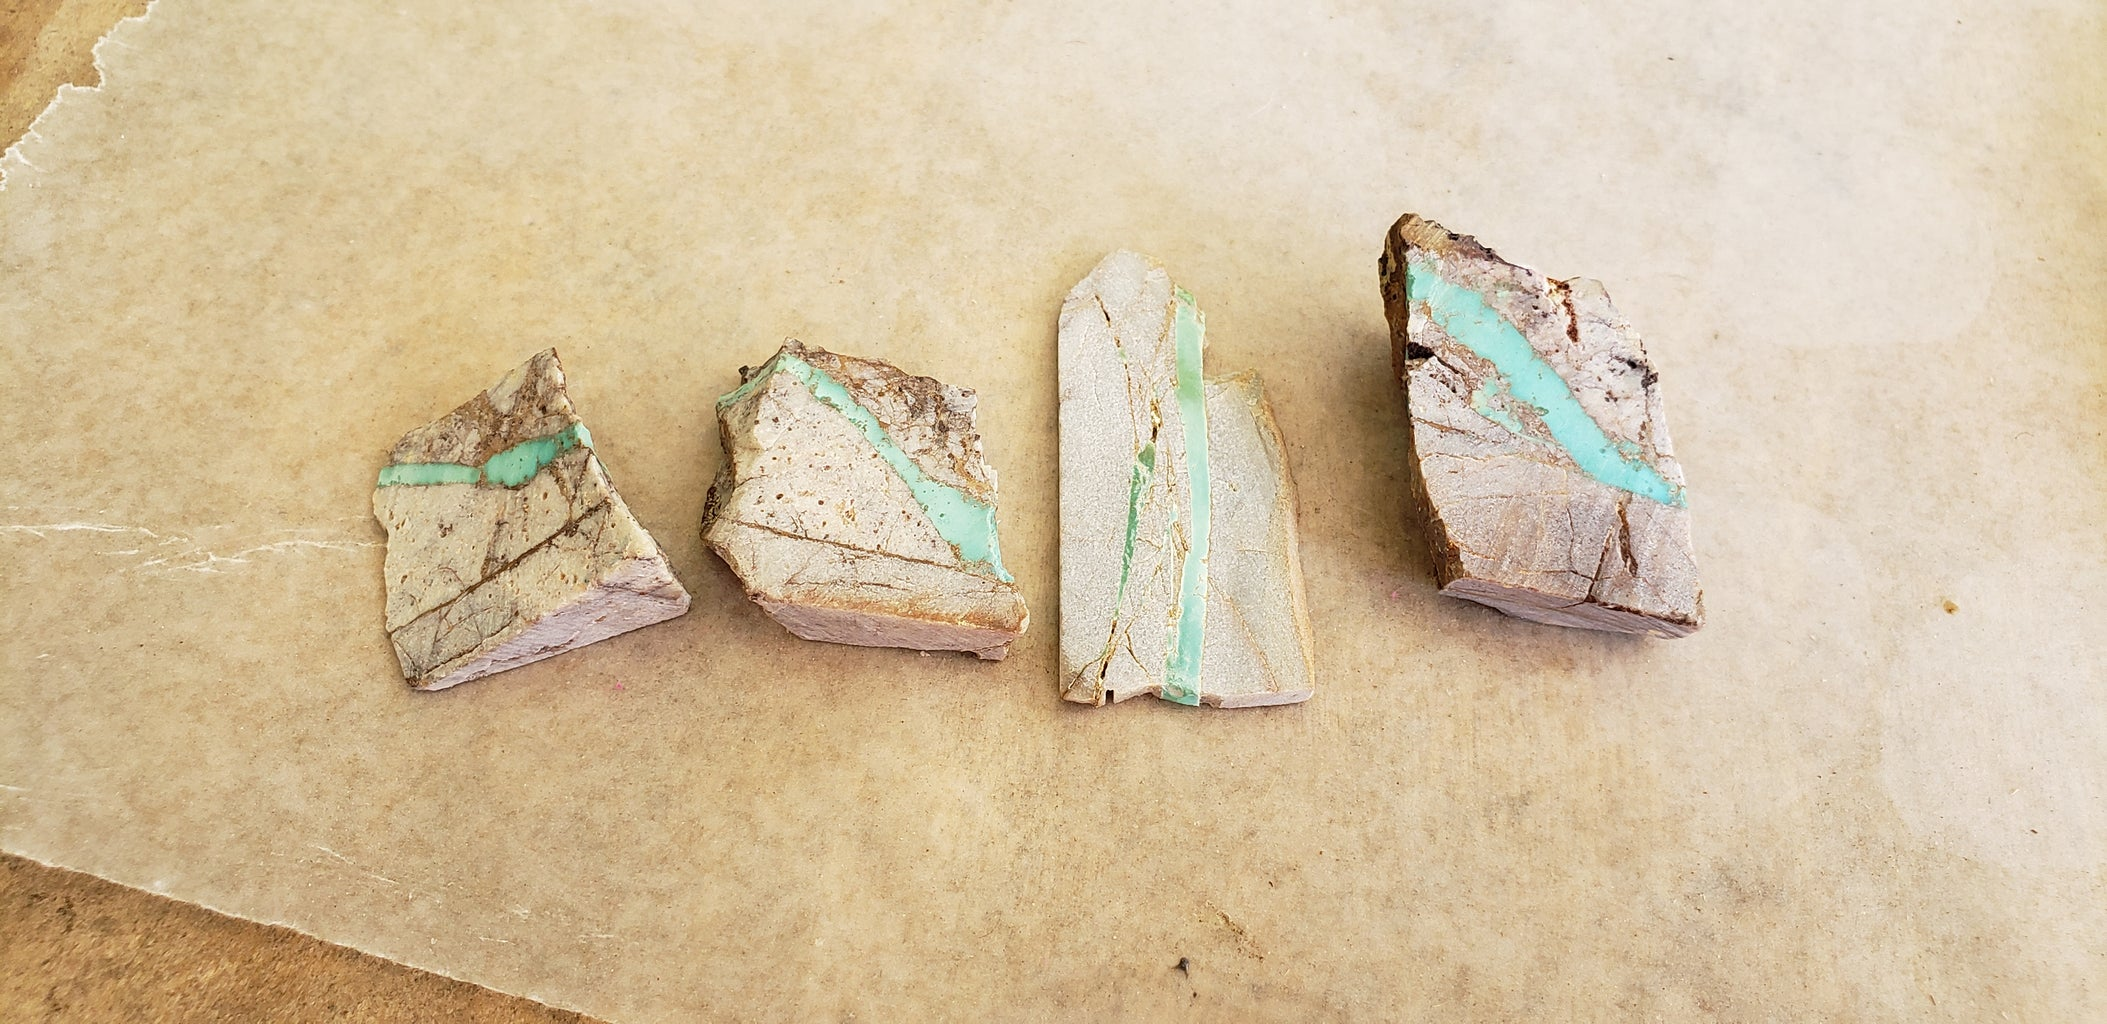 Clean Stones